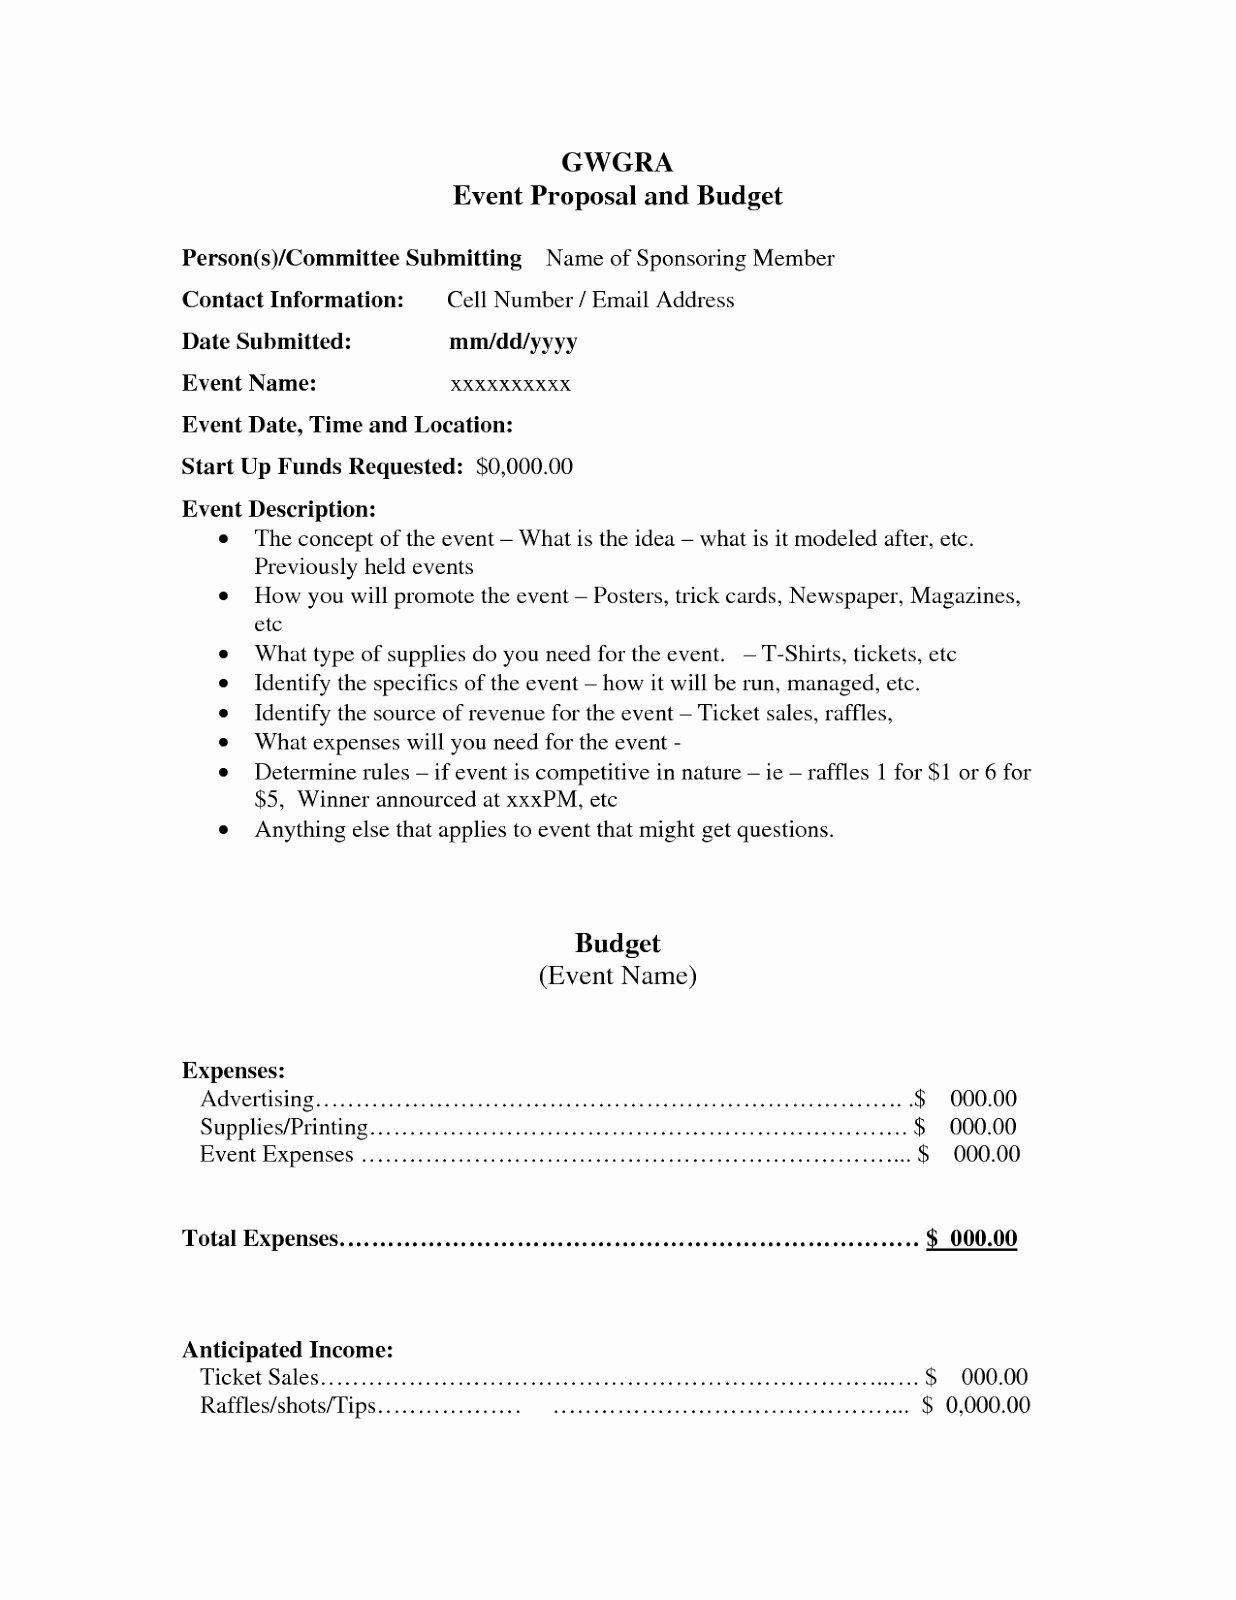 Free Proposal form Template Elegant event Proposal Template Free Download Excel Template